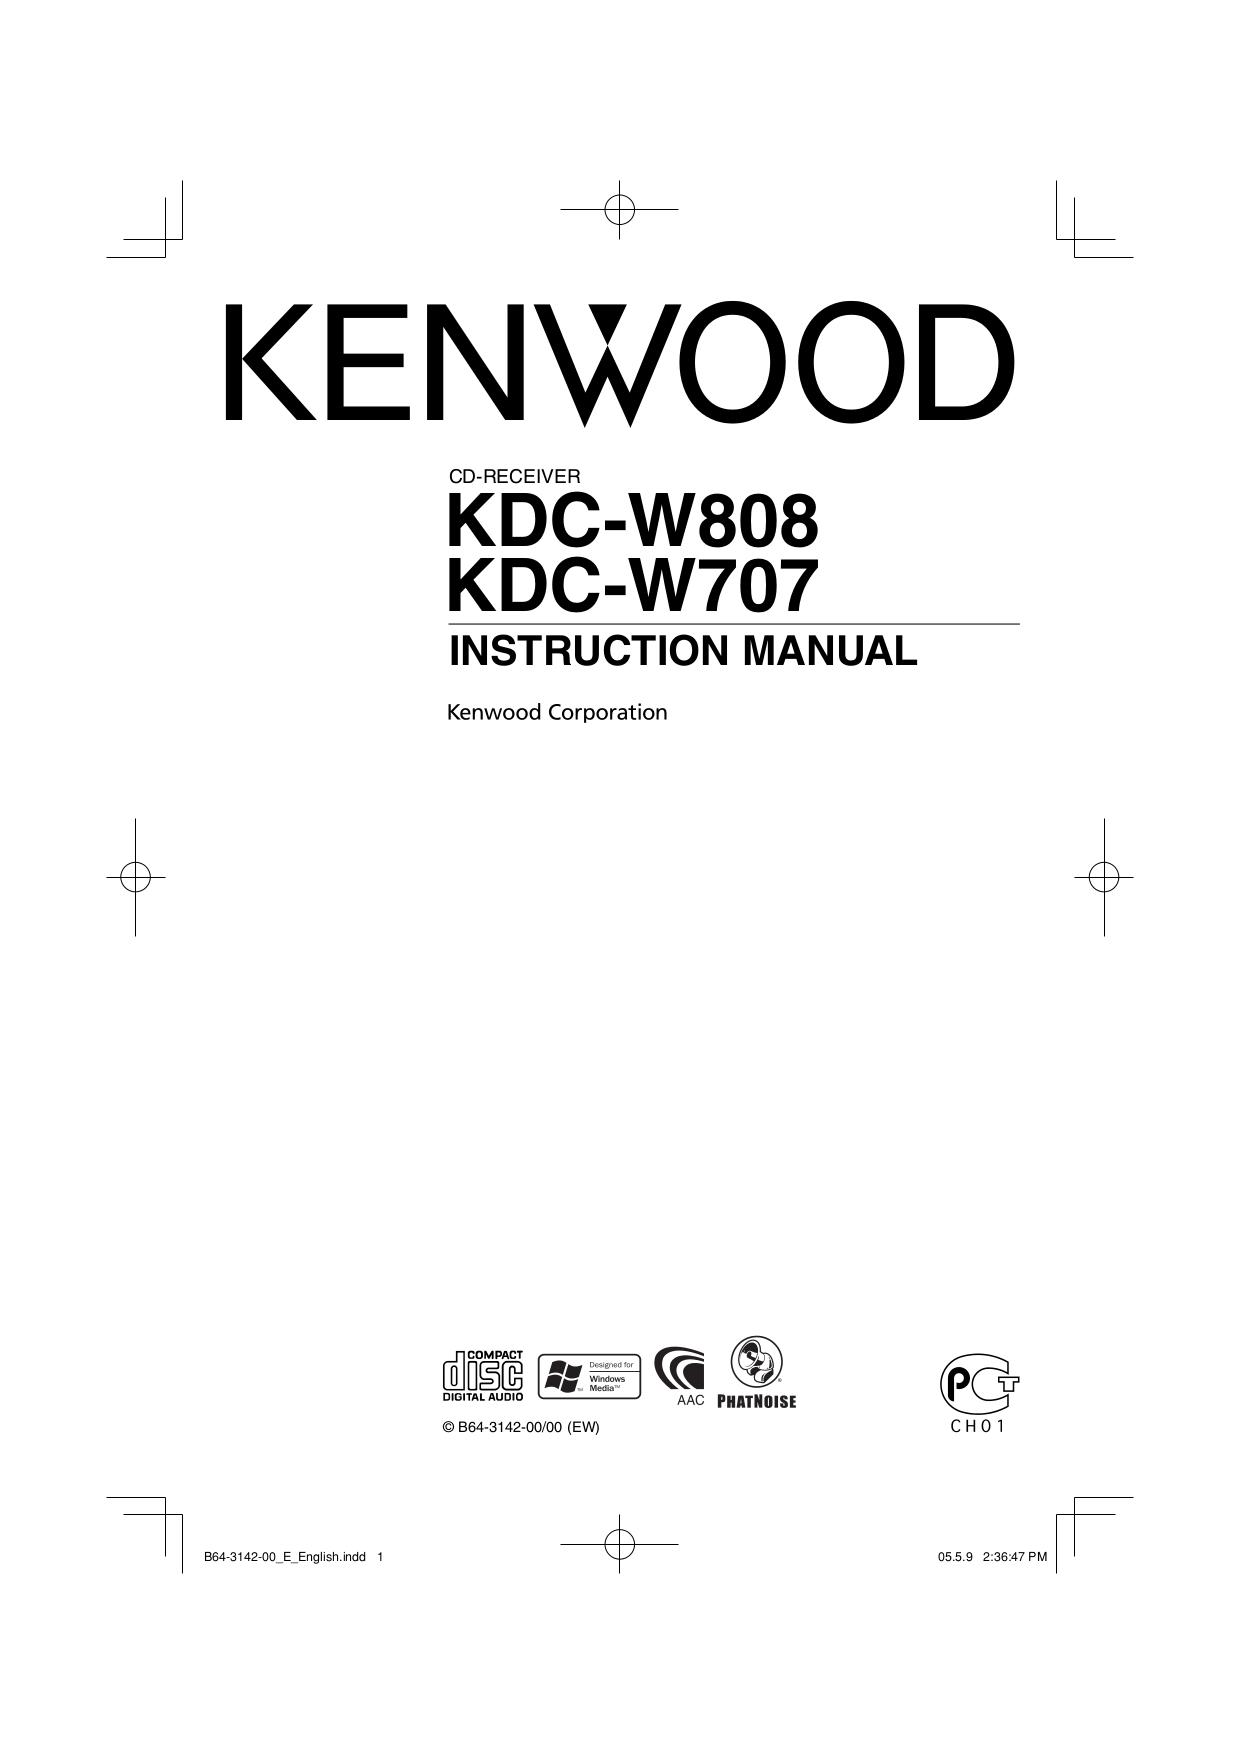 Download Free For Kenwood Kdc 128 Car Receiver Manual